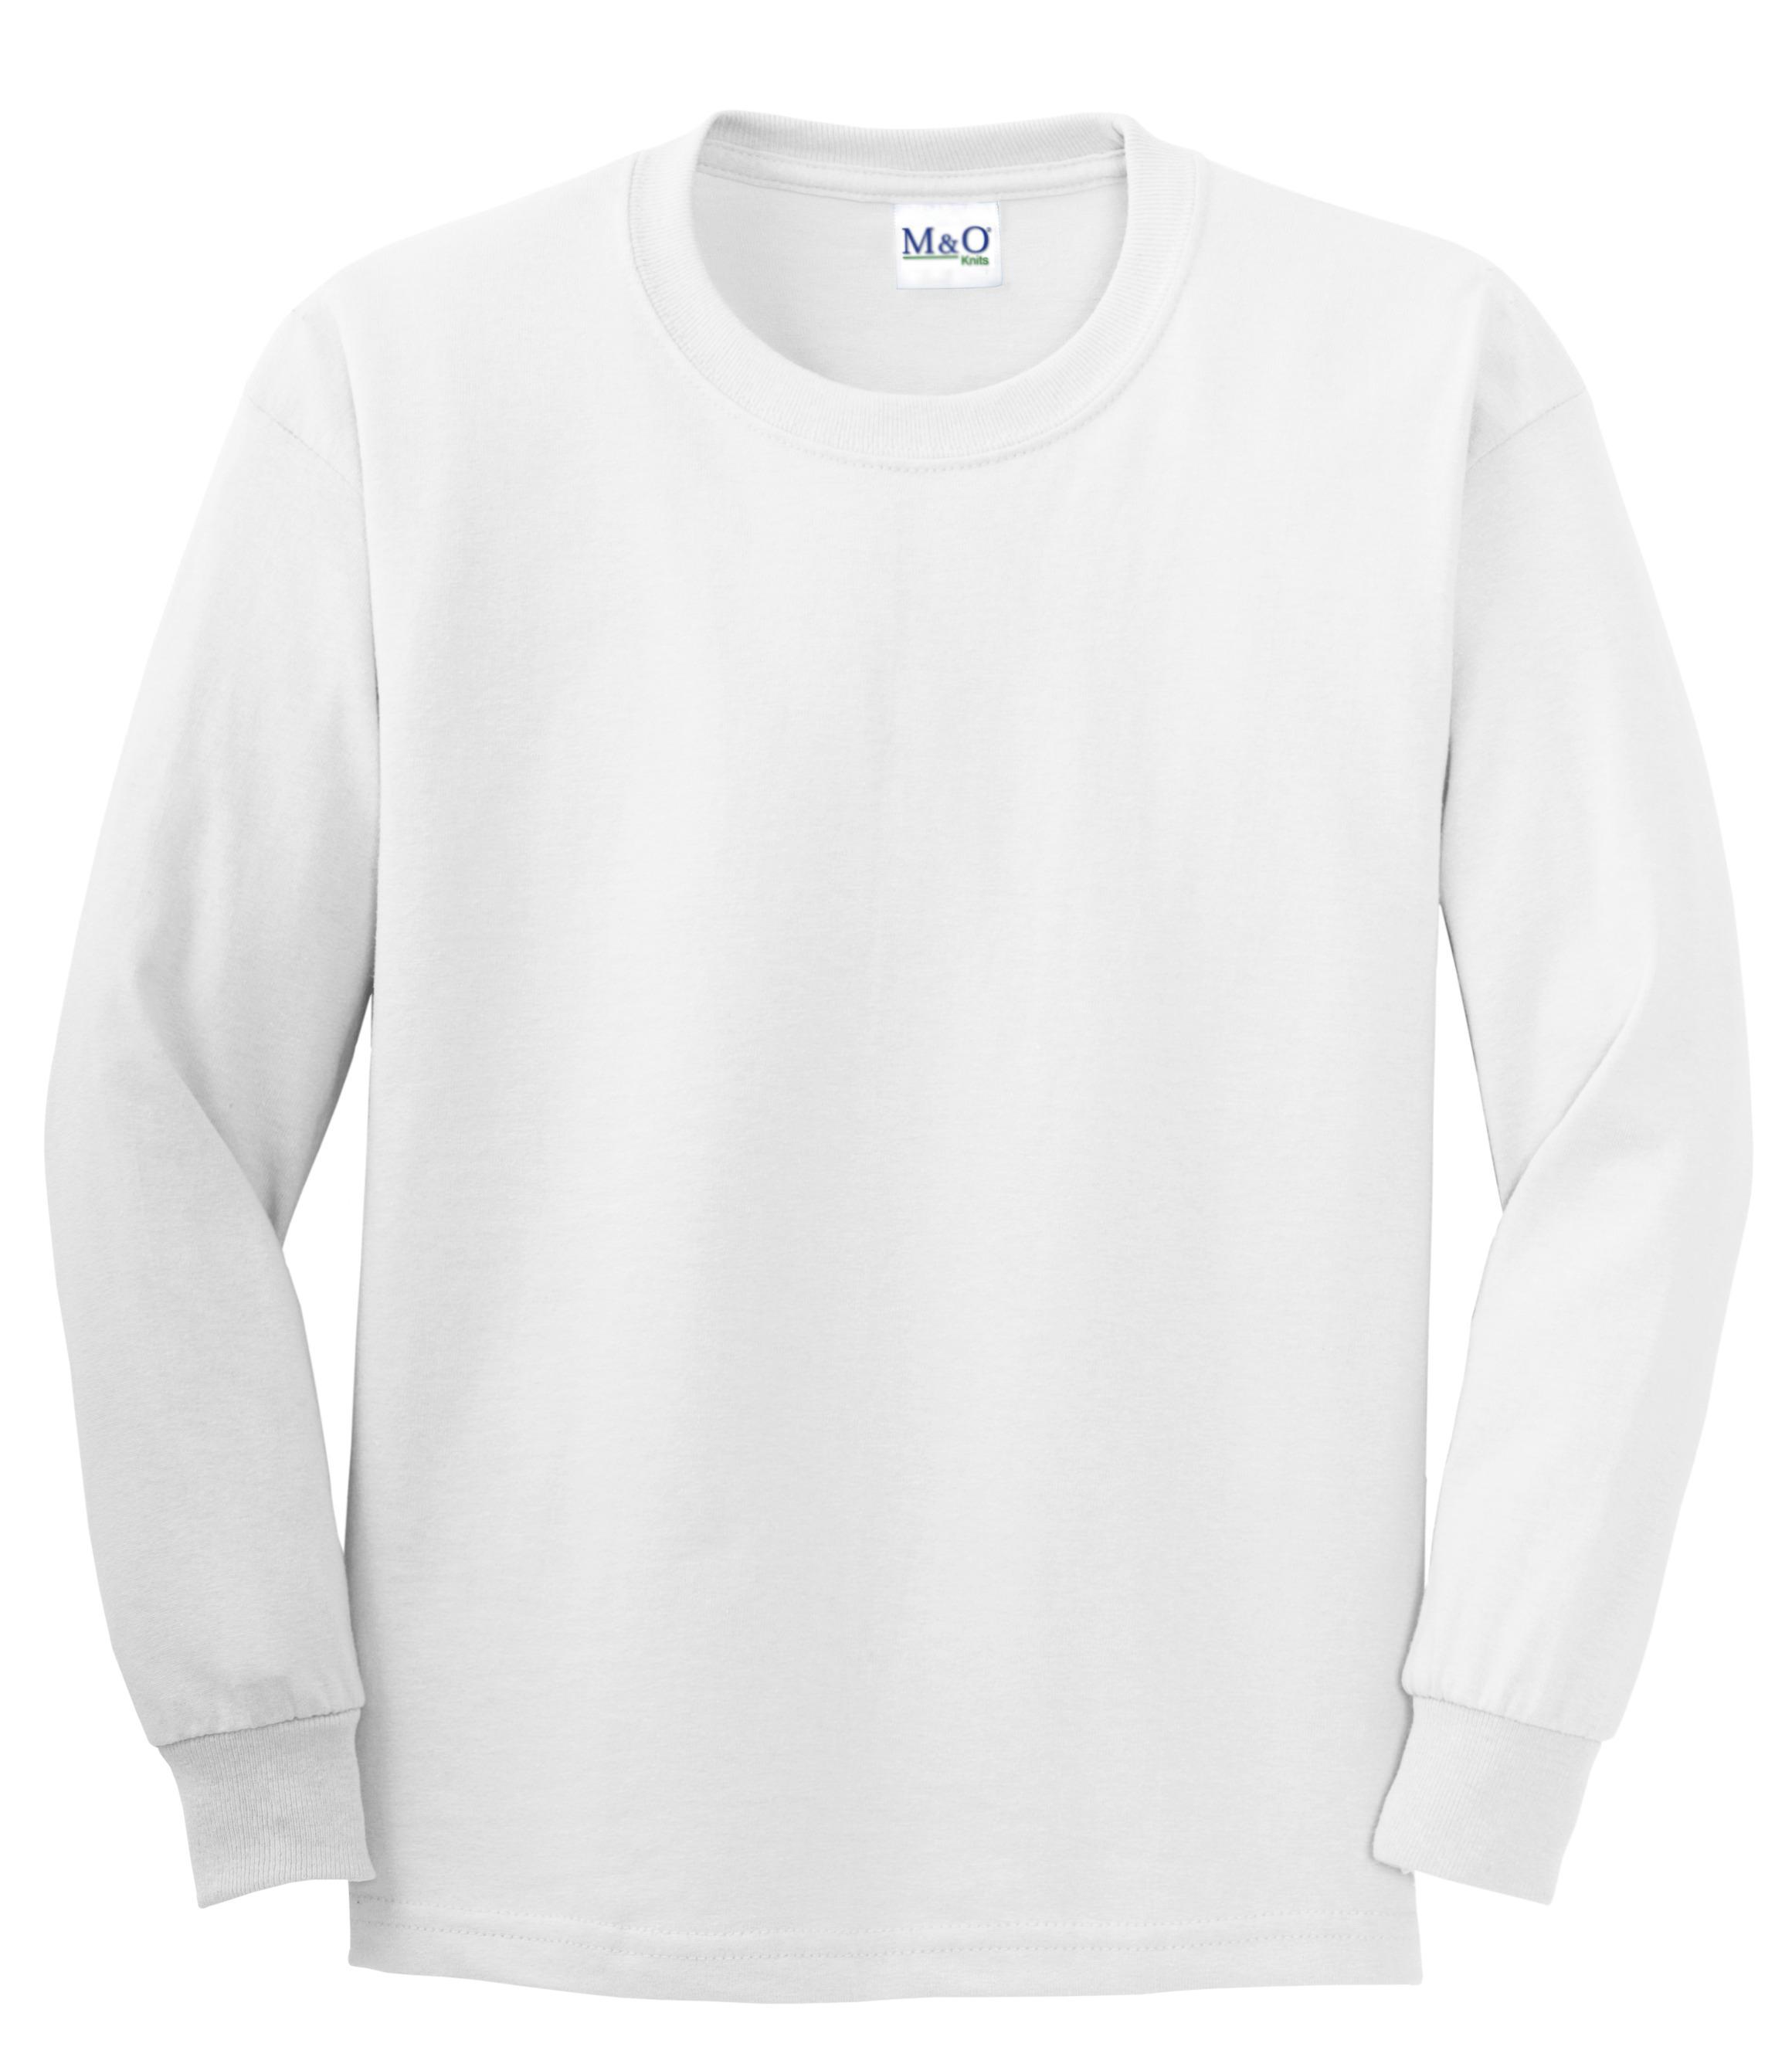 Custom T Shirt Printing Toronto